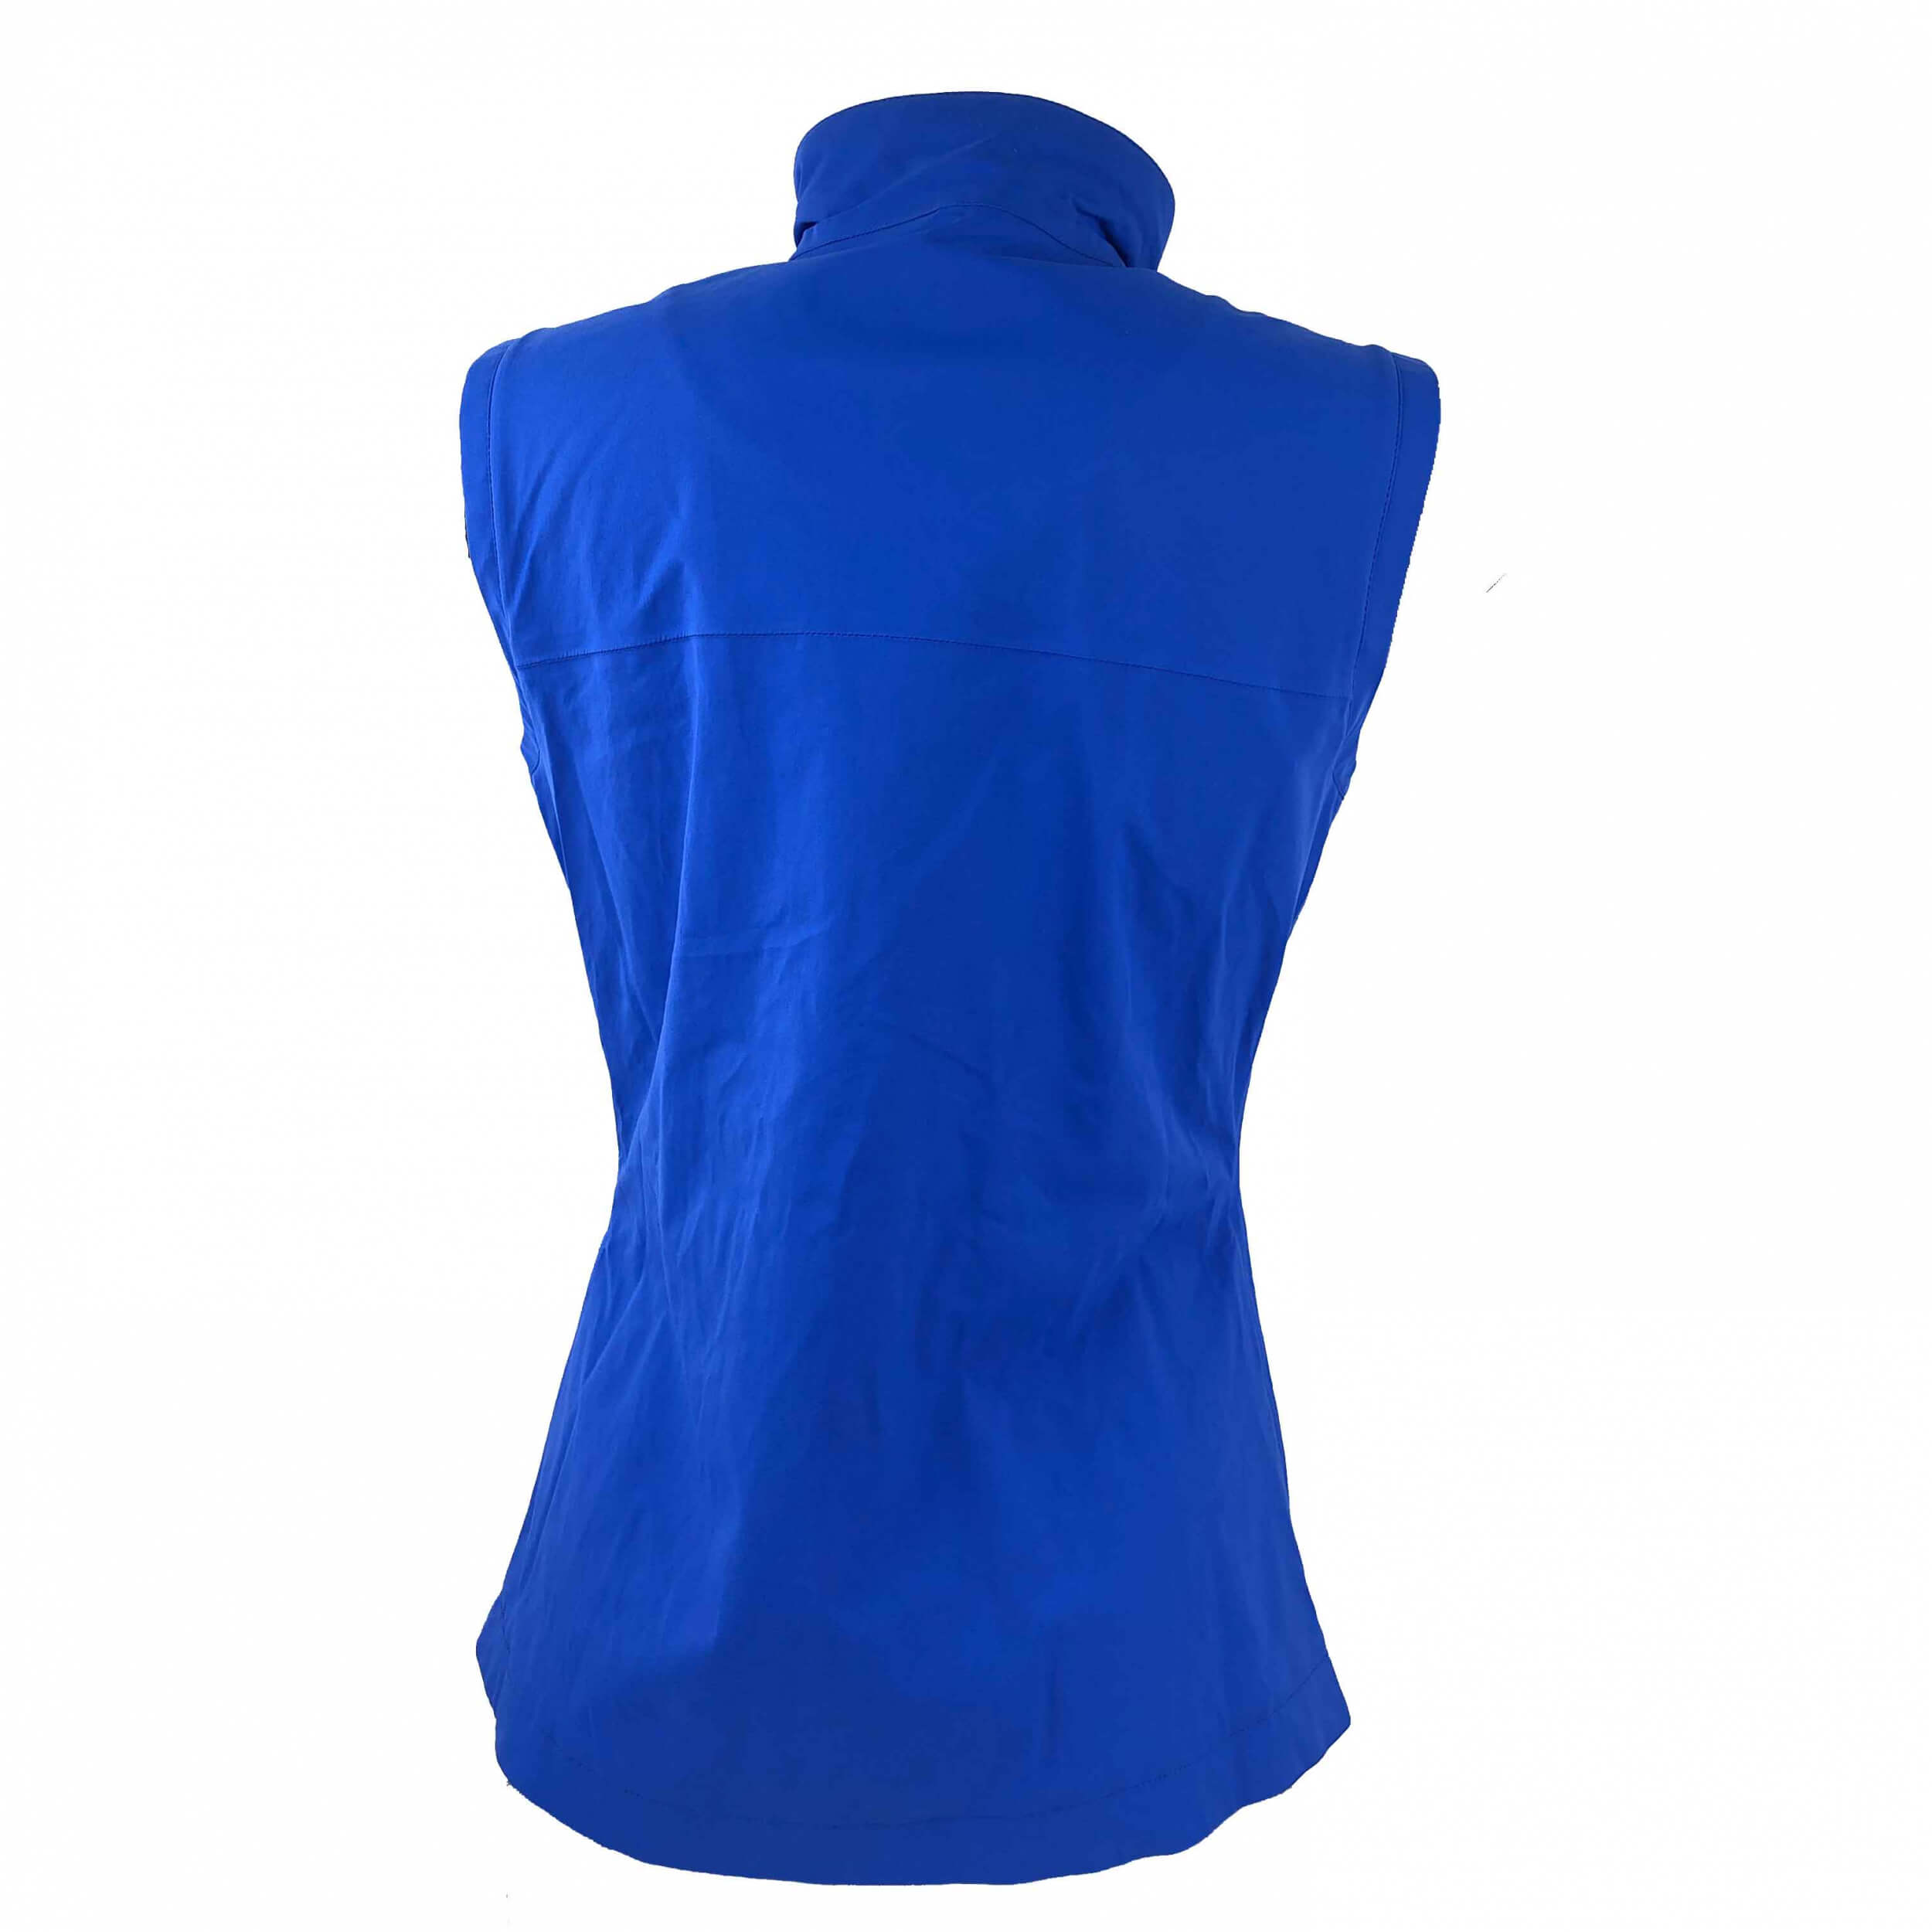 Chervo Damen Regen Weste Epos blau 594